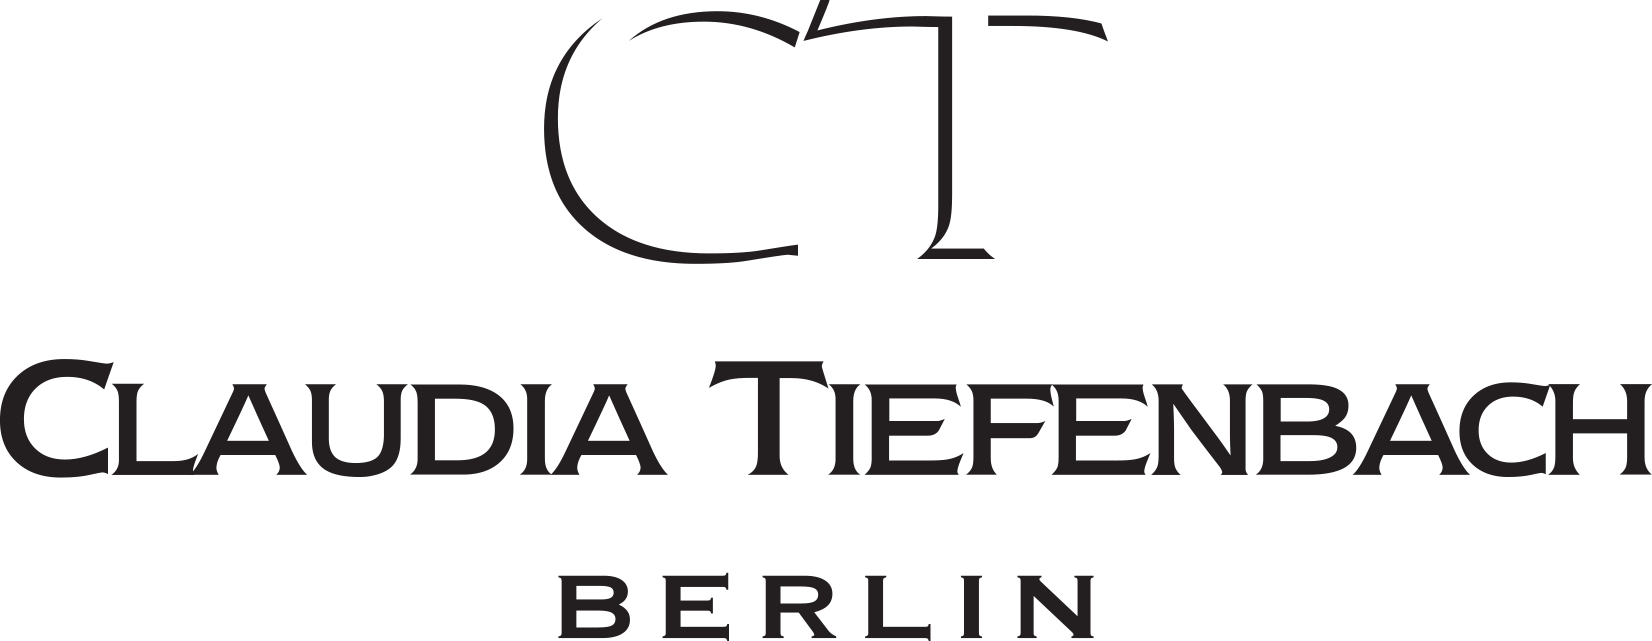 CT Claudia Tiefenbach Favicon